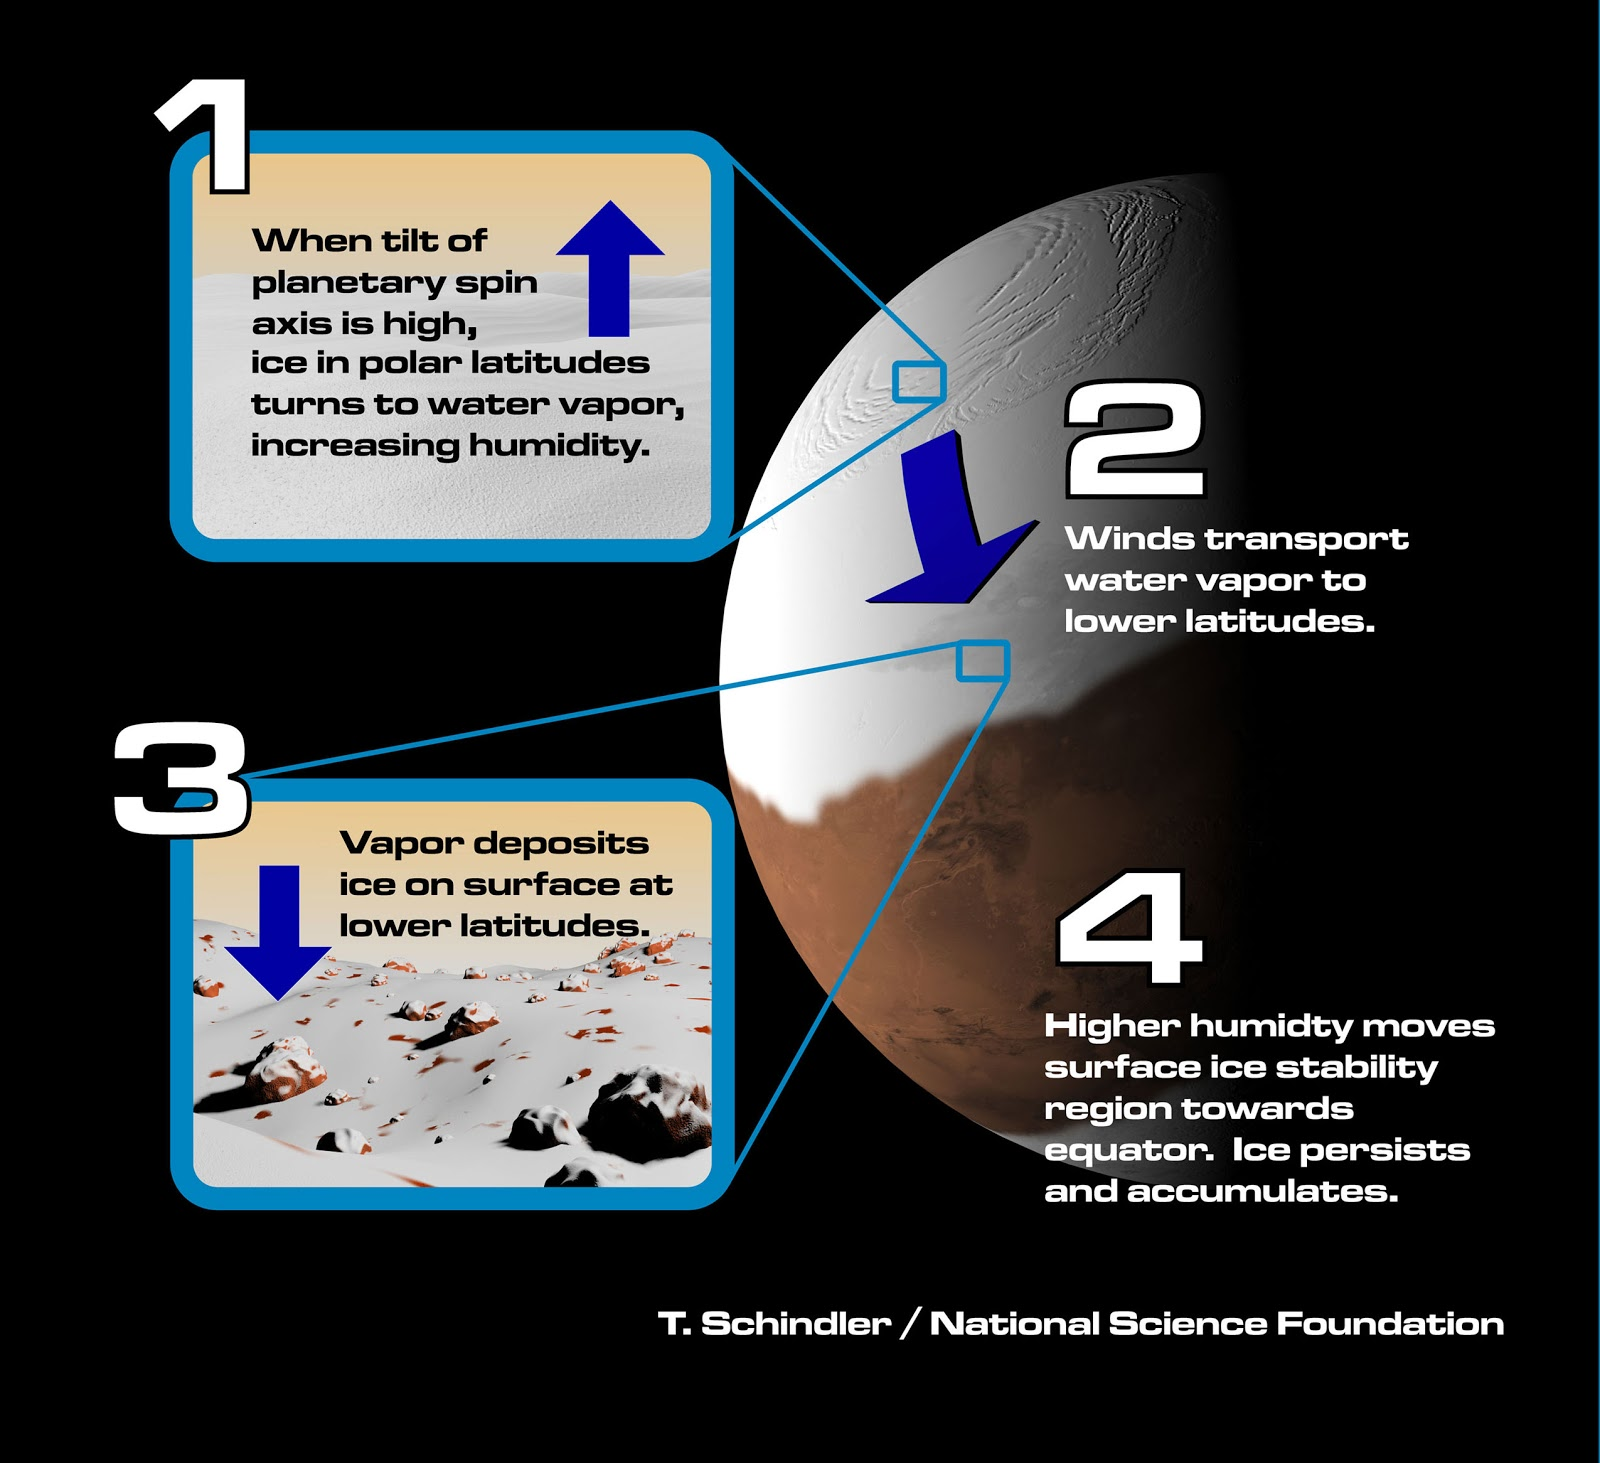 Mars στον Σκορπιό που χρονολογείται ραντεβού με παλιά έπιπλα καρυδιάς